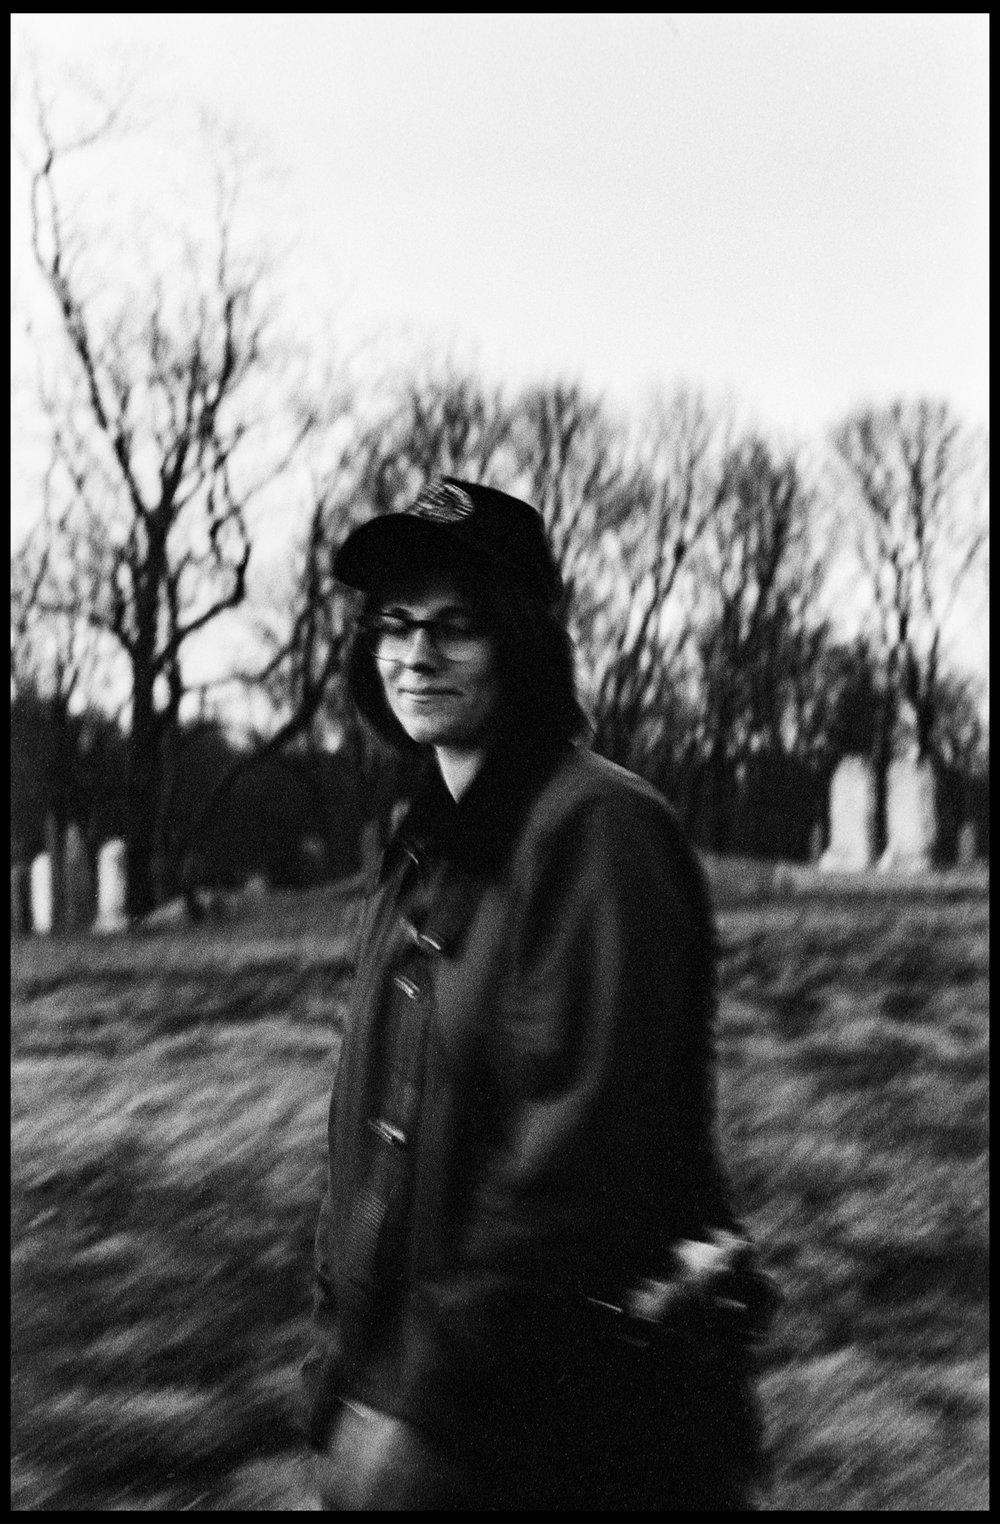 nick dinatale_mollie_portrait_marblehead_35mm film leica-1.jpg